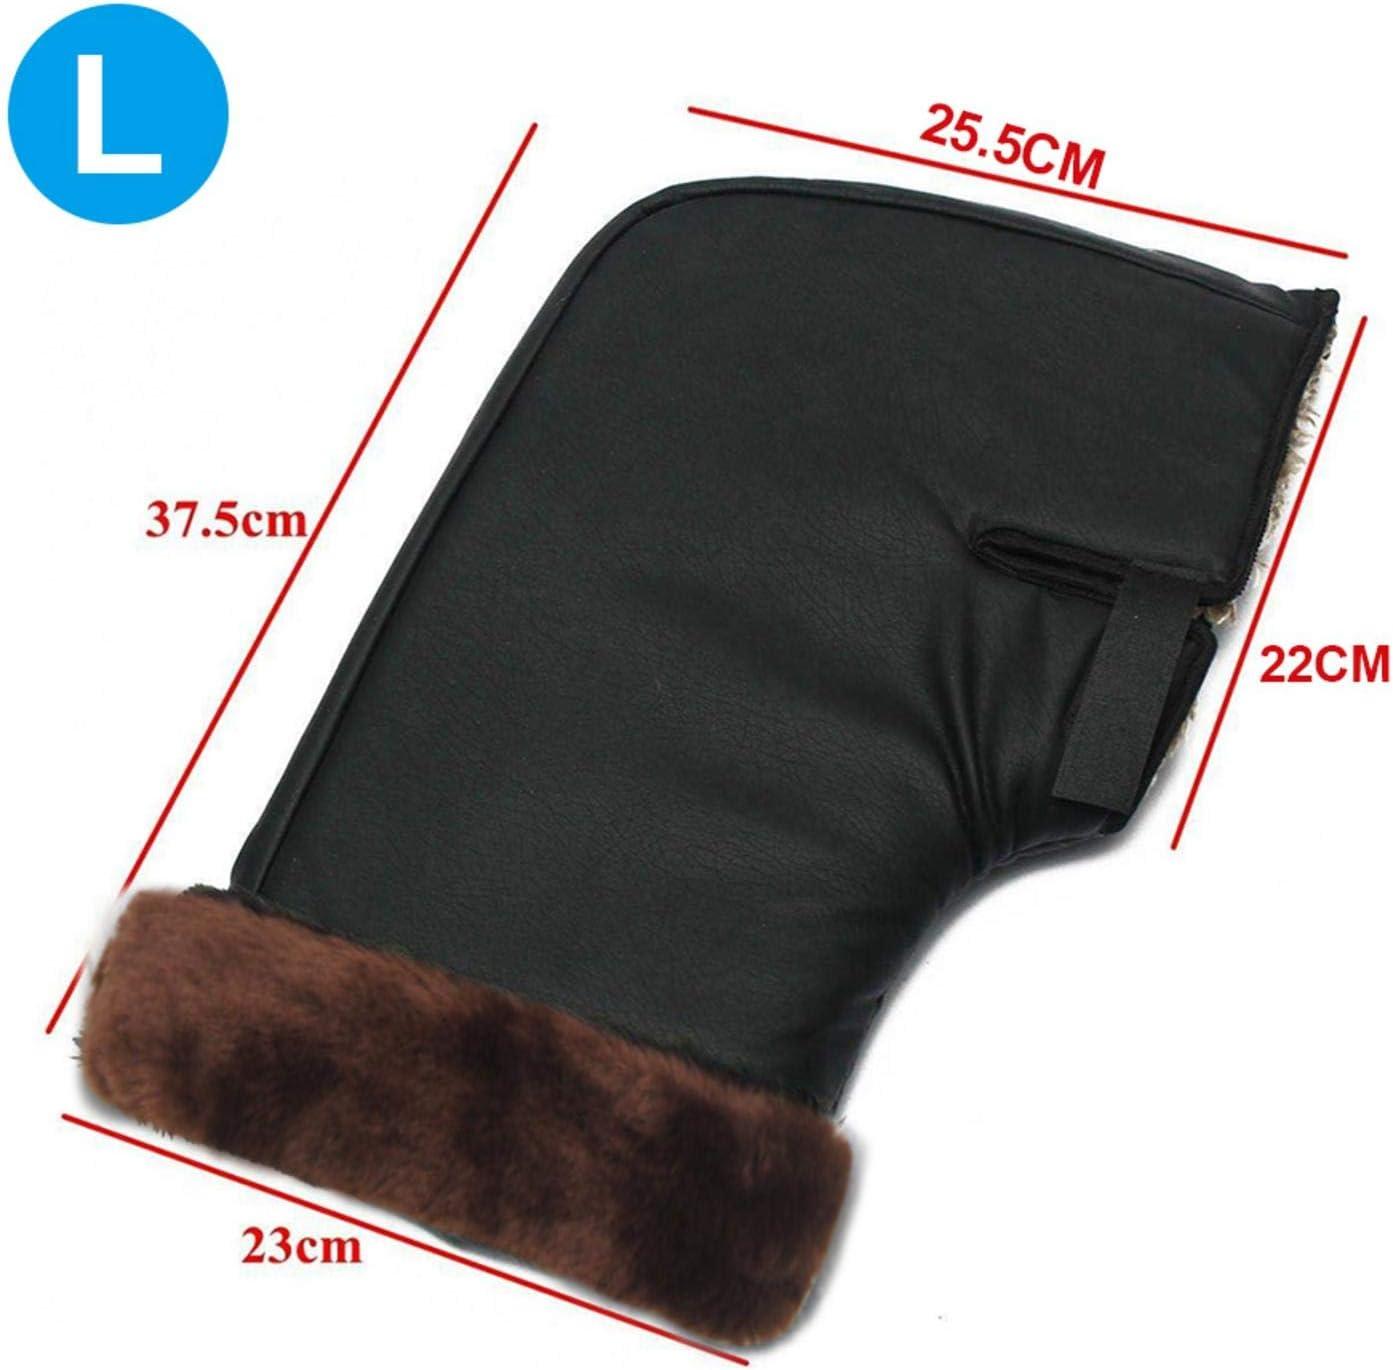 Chuanfeng Winter Motorradhandschuh Warme Muffs Handschuhe Für Roller Scooter Fahrrad Motorrad Handlebar Cover Gloves Lenkerstulpen Auto